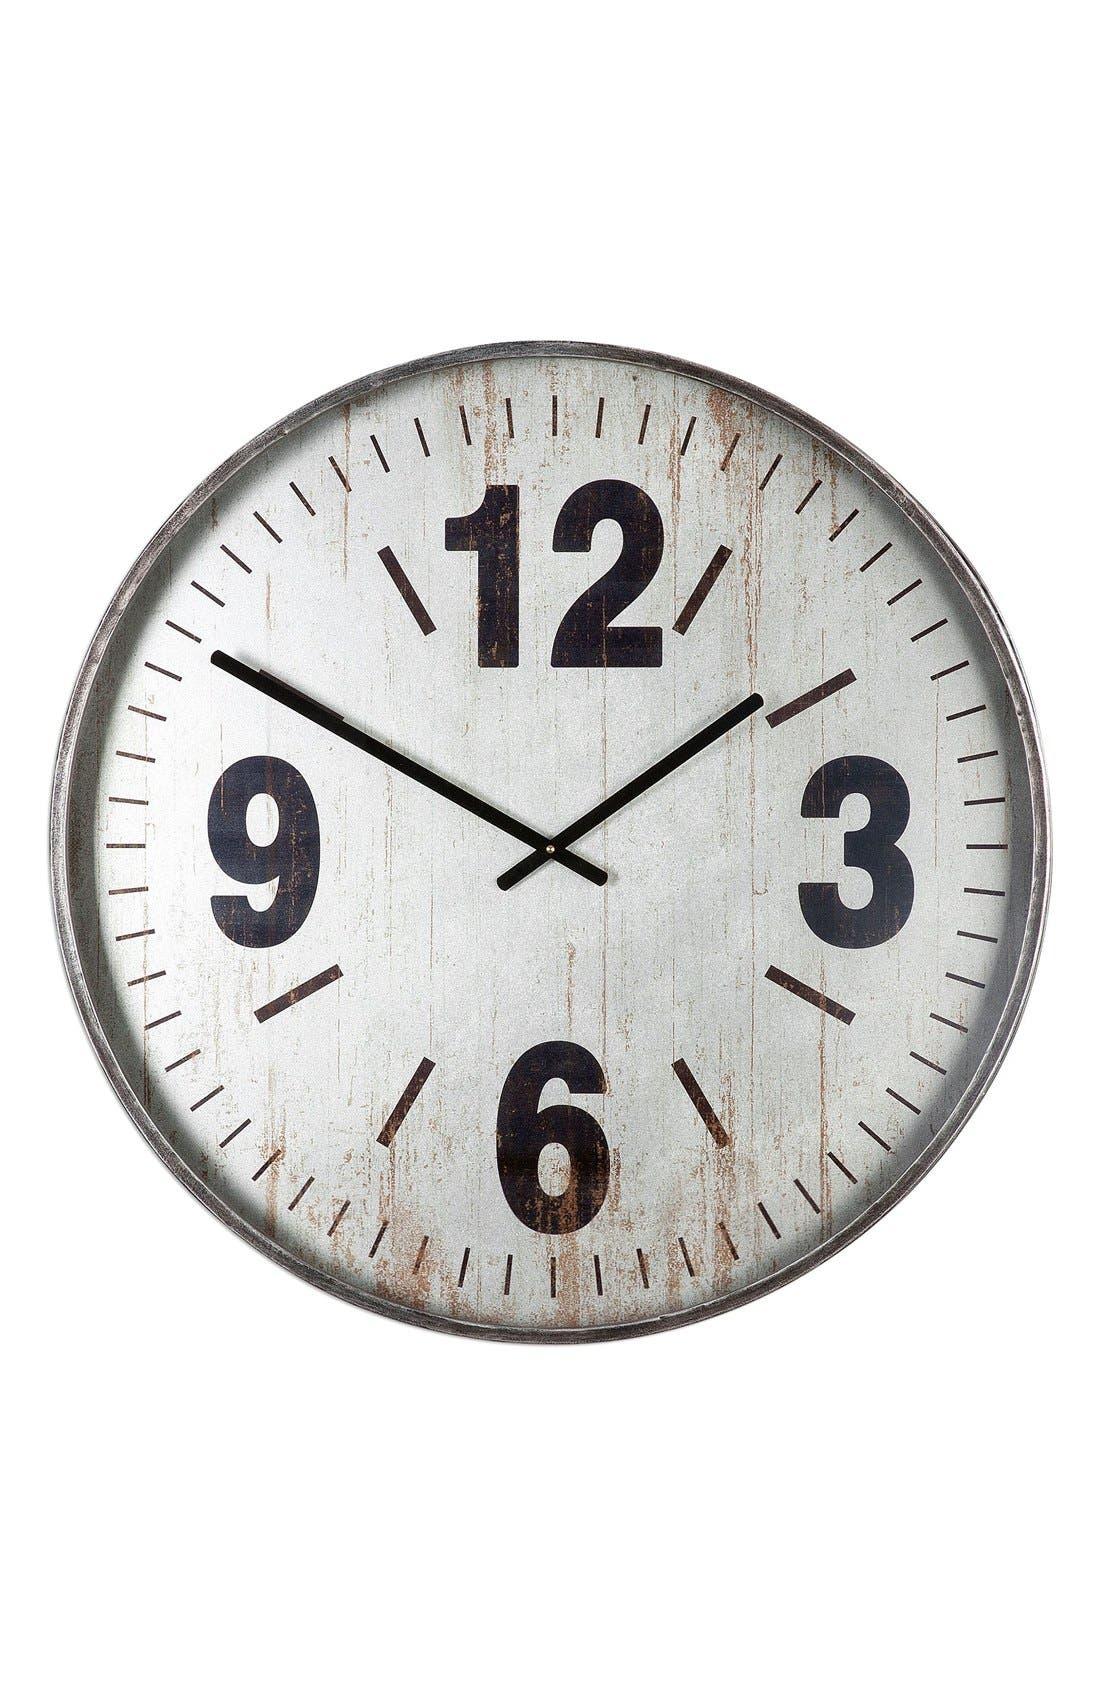 Main Image - Uttermost 'Marino' Wall Clock